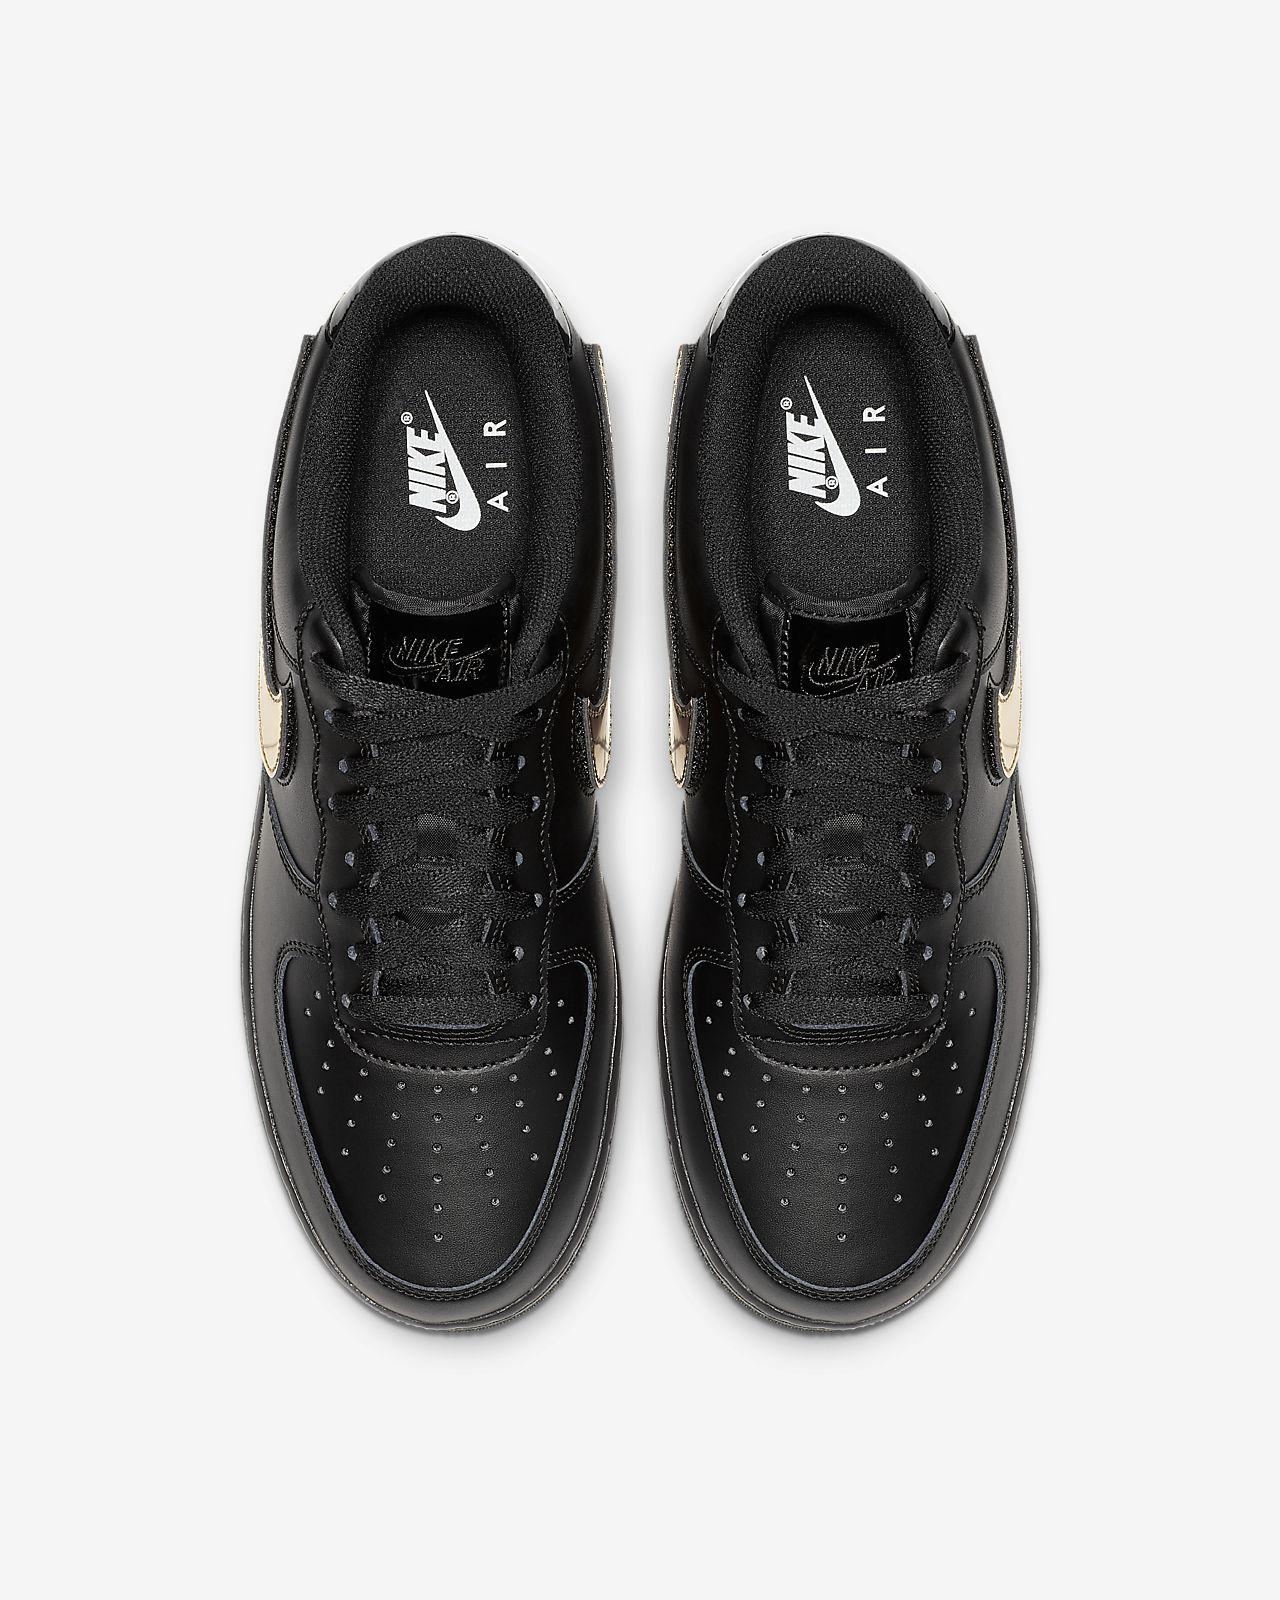 Nike Air Force 1'07 LV8 3 BLACK BLACK WHITE MEN'S Scarpe Da Ginnastica Tutte Le Taglie